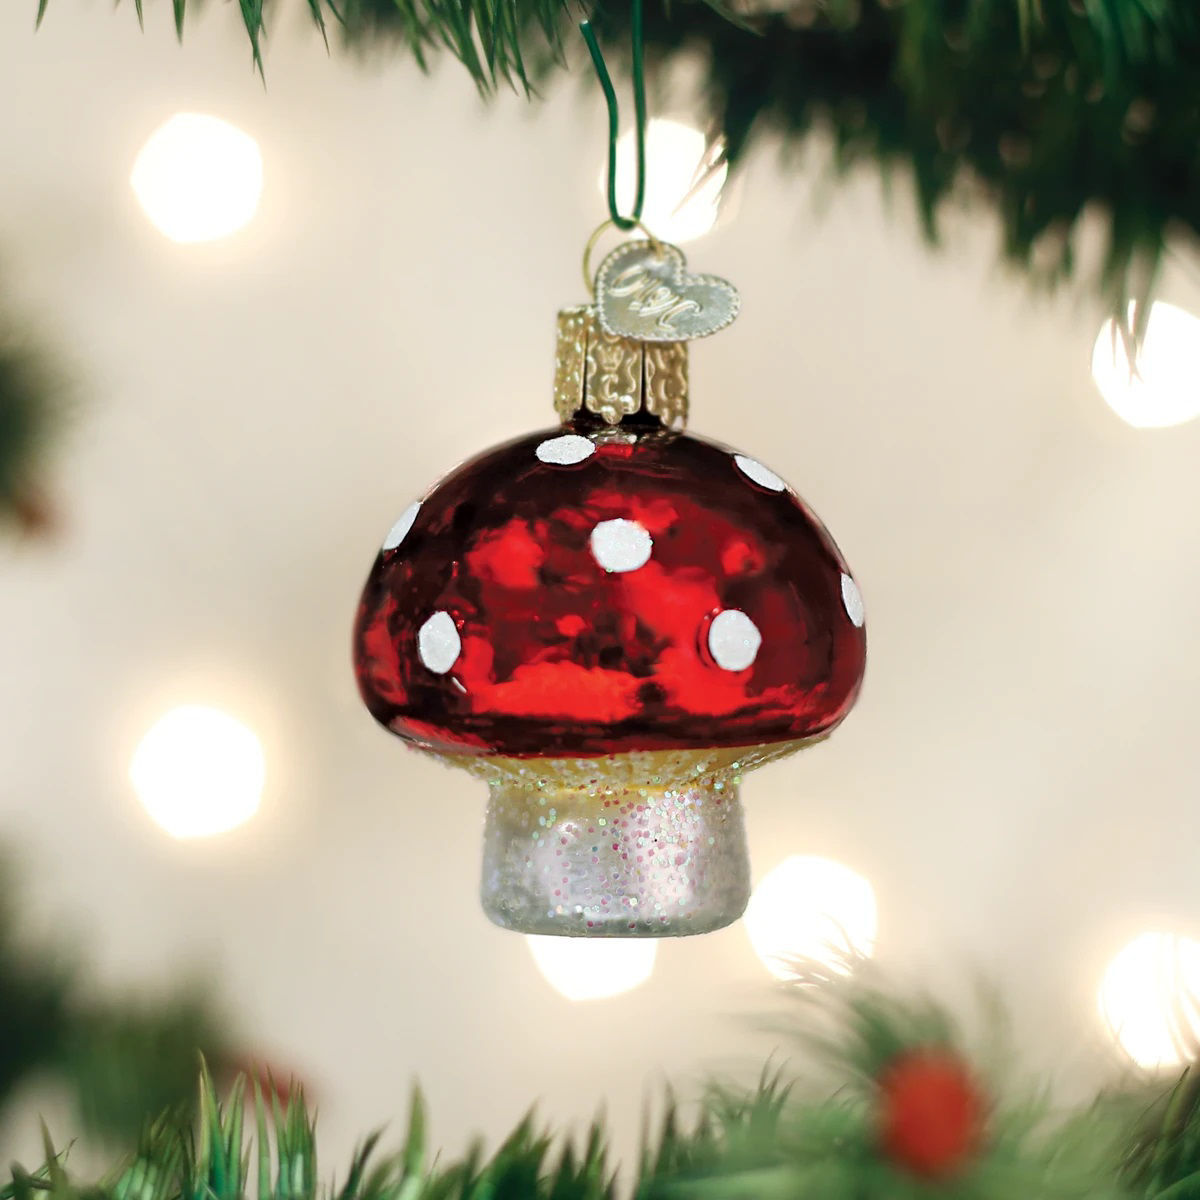 Lucky Mushroom Ornament by Old World Christmas